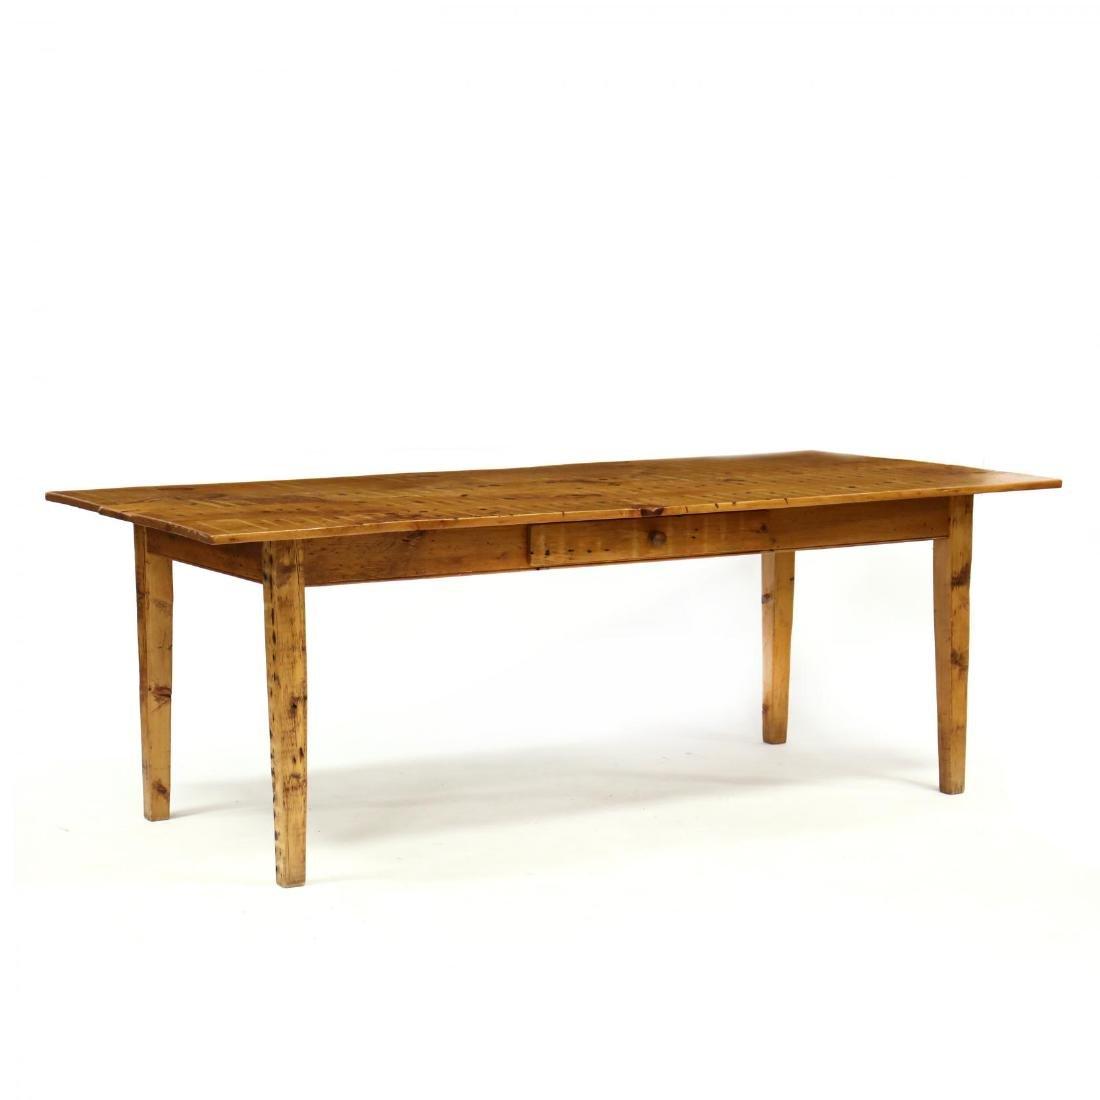 Staples Cabinet Makers, Custom Pine Farm Table